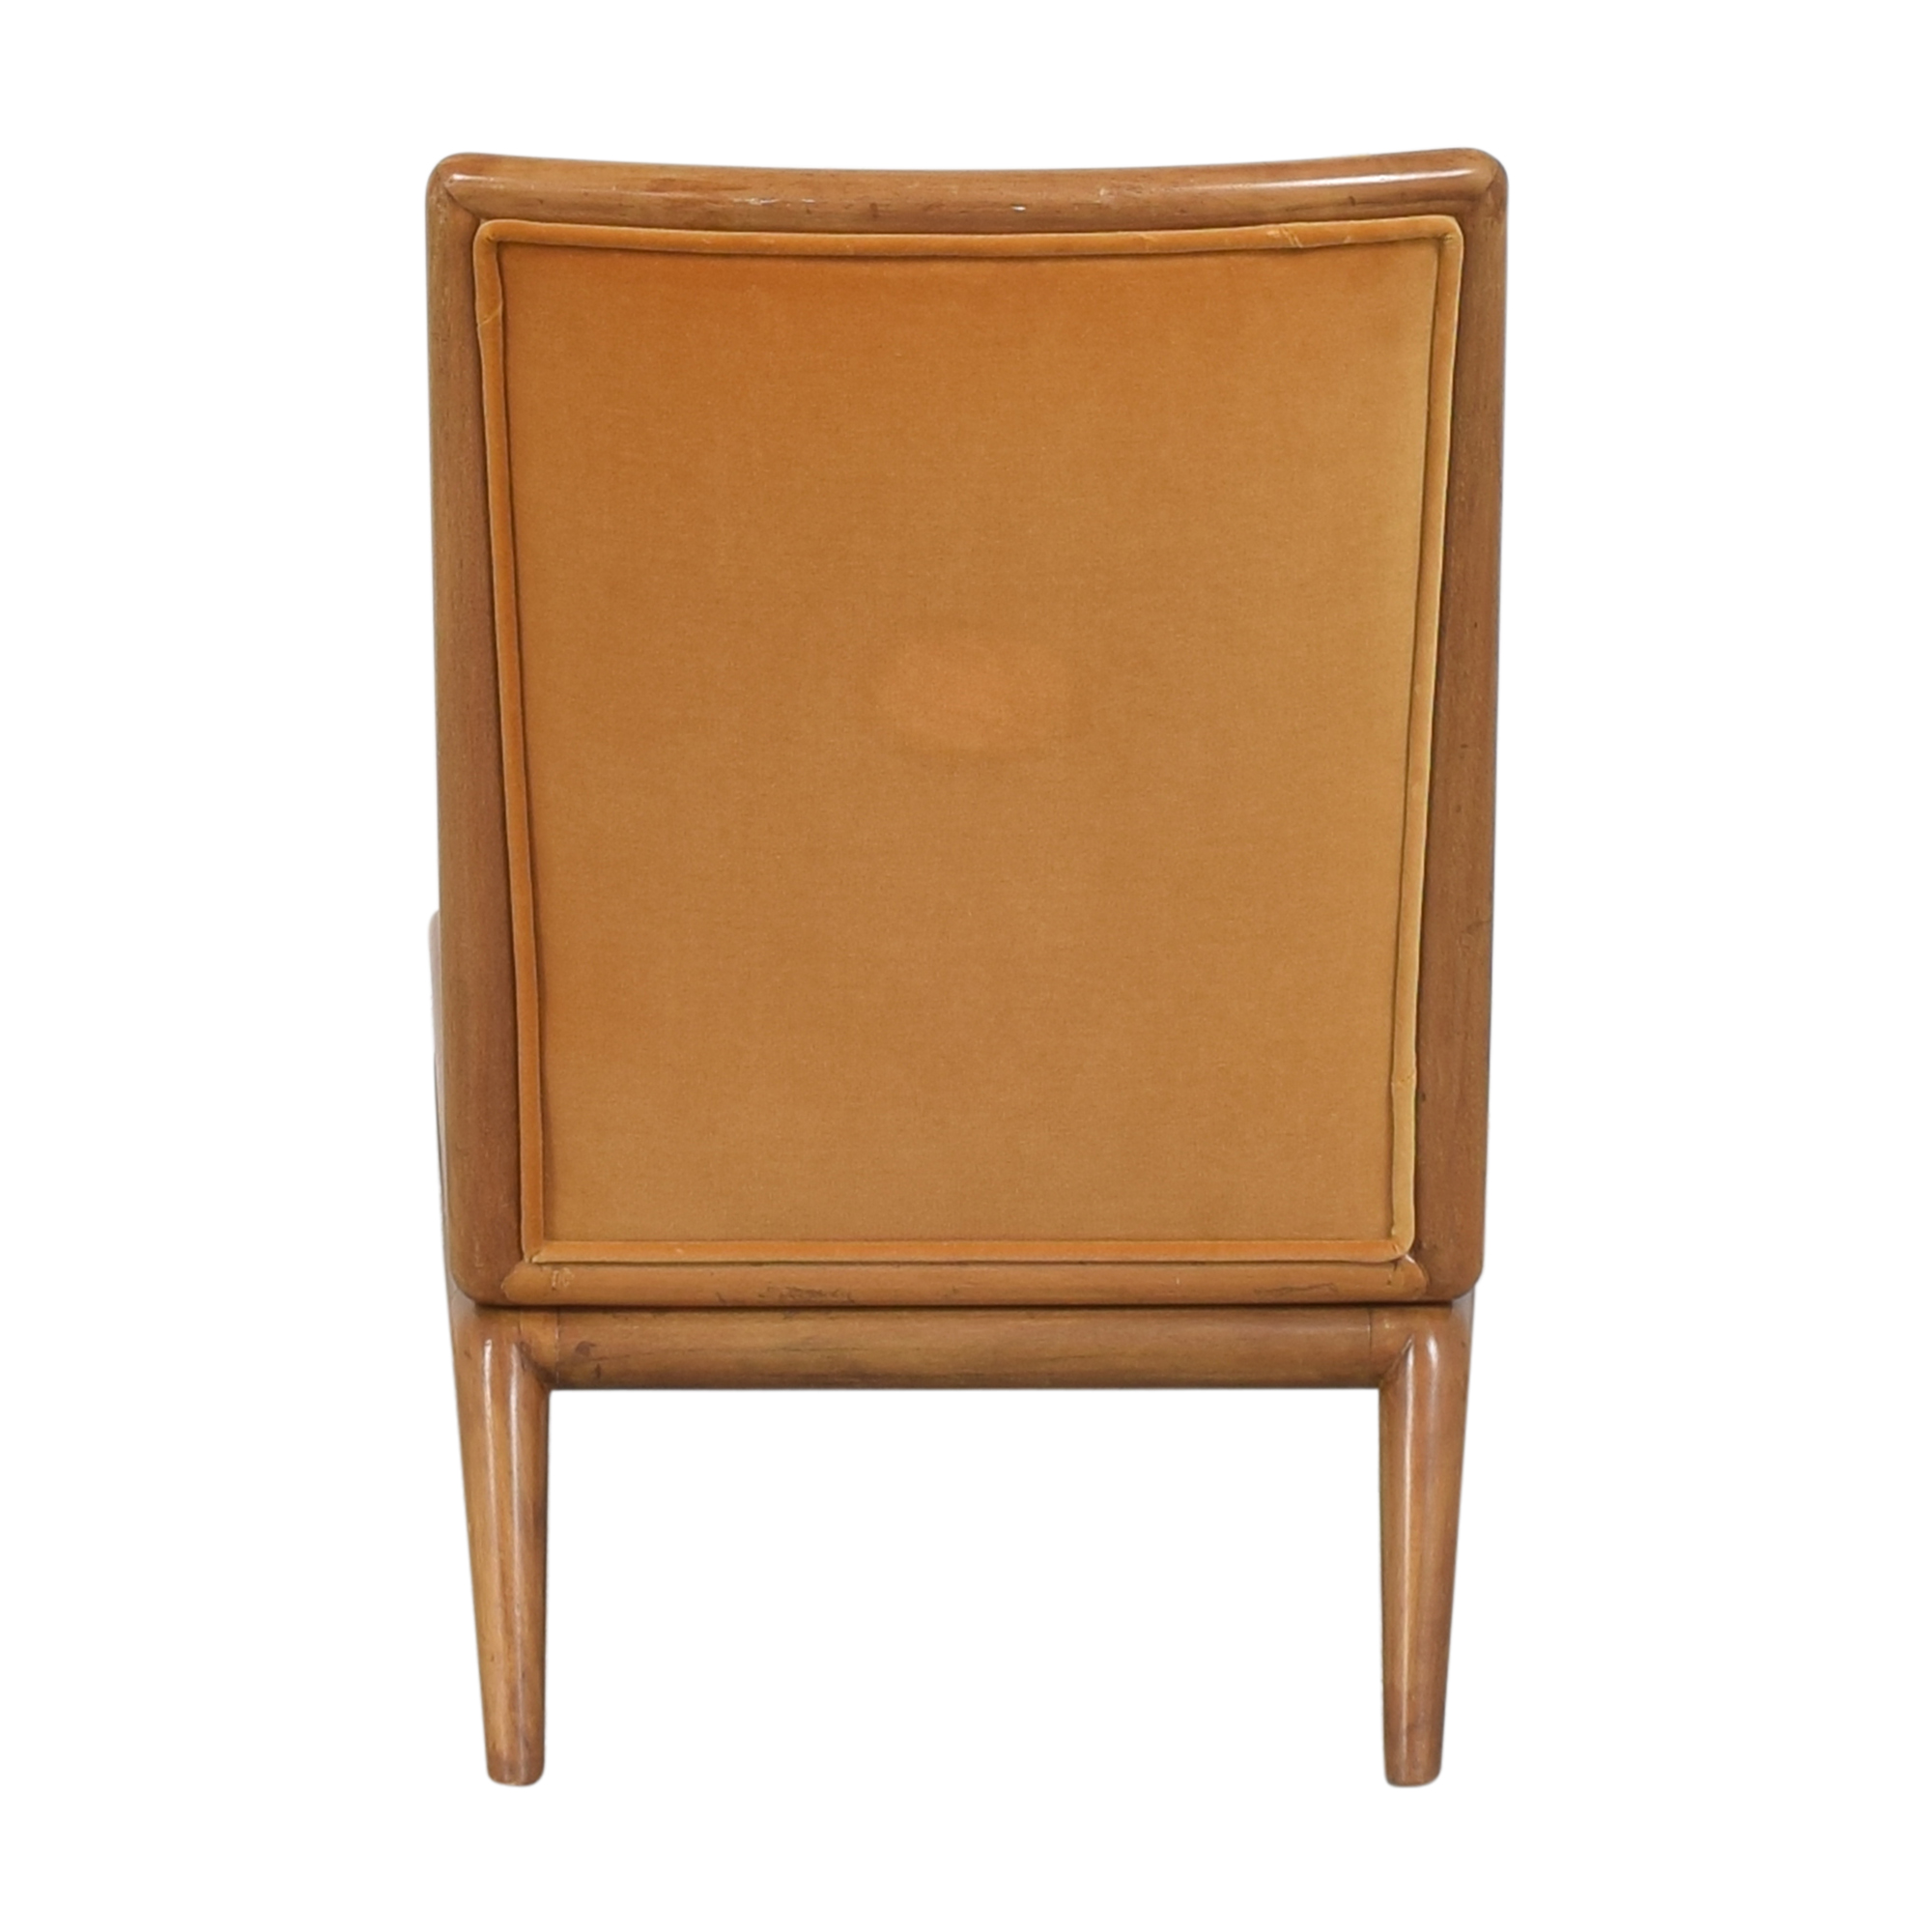 Widdicomb T.H. Robsjohn Gibbings for Widdicomb Slipper Chair discount